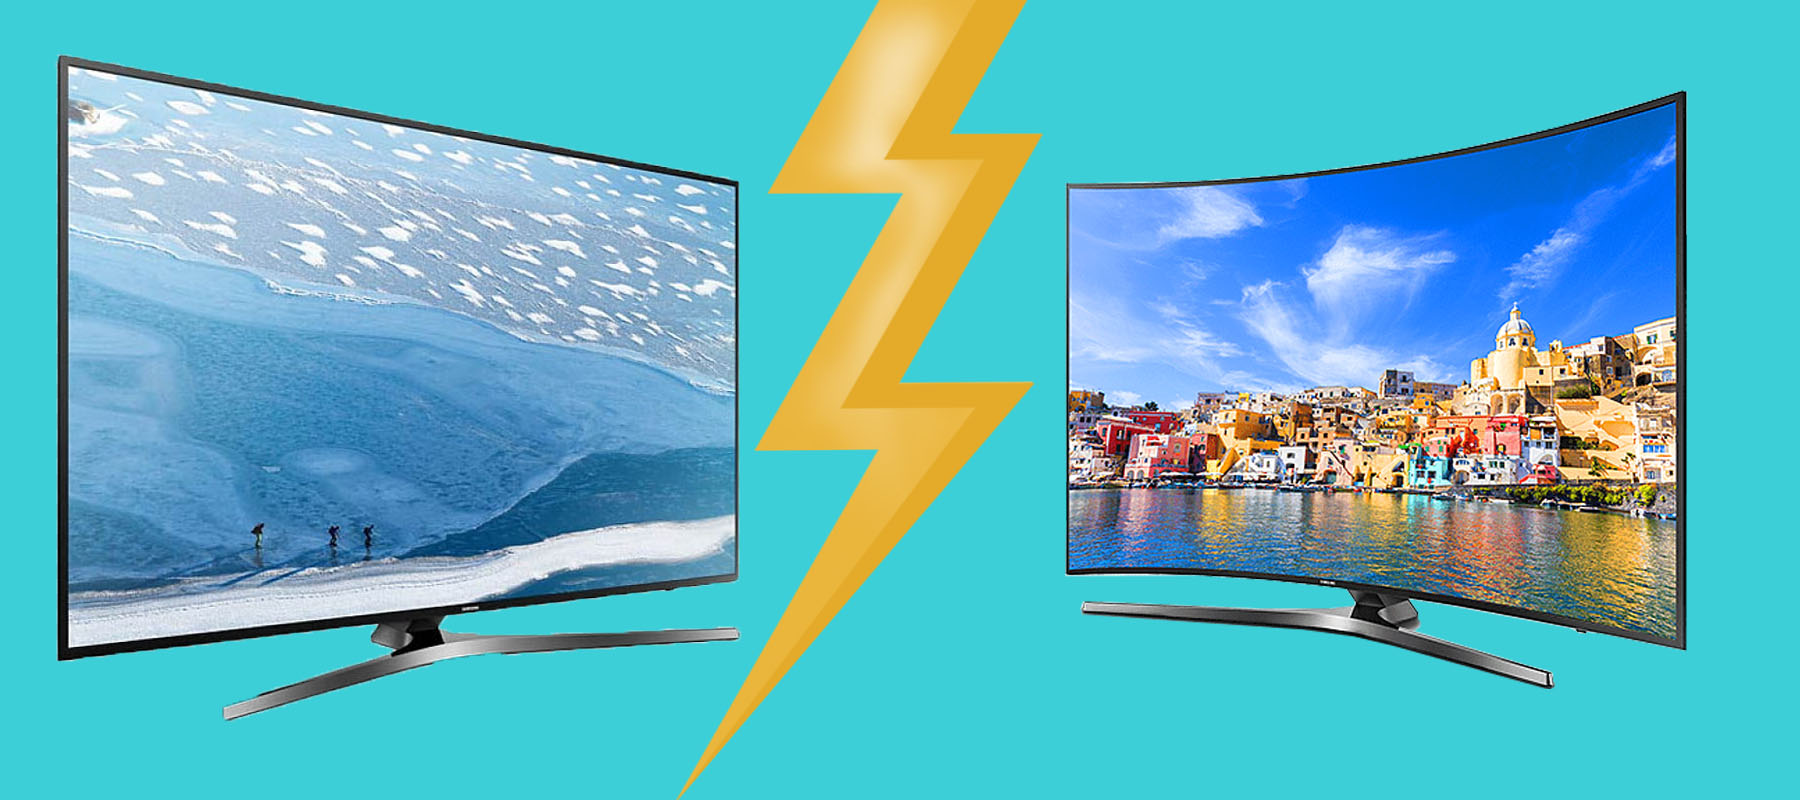 تفاوت تلویزیون منحنی با تخت